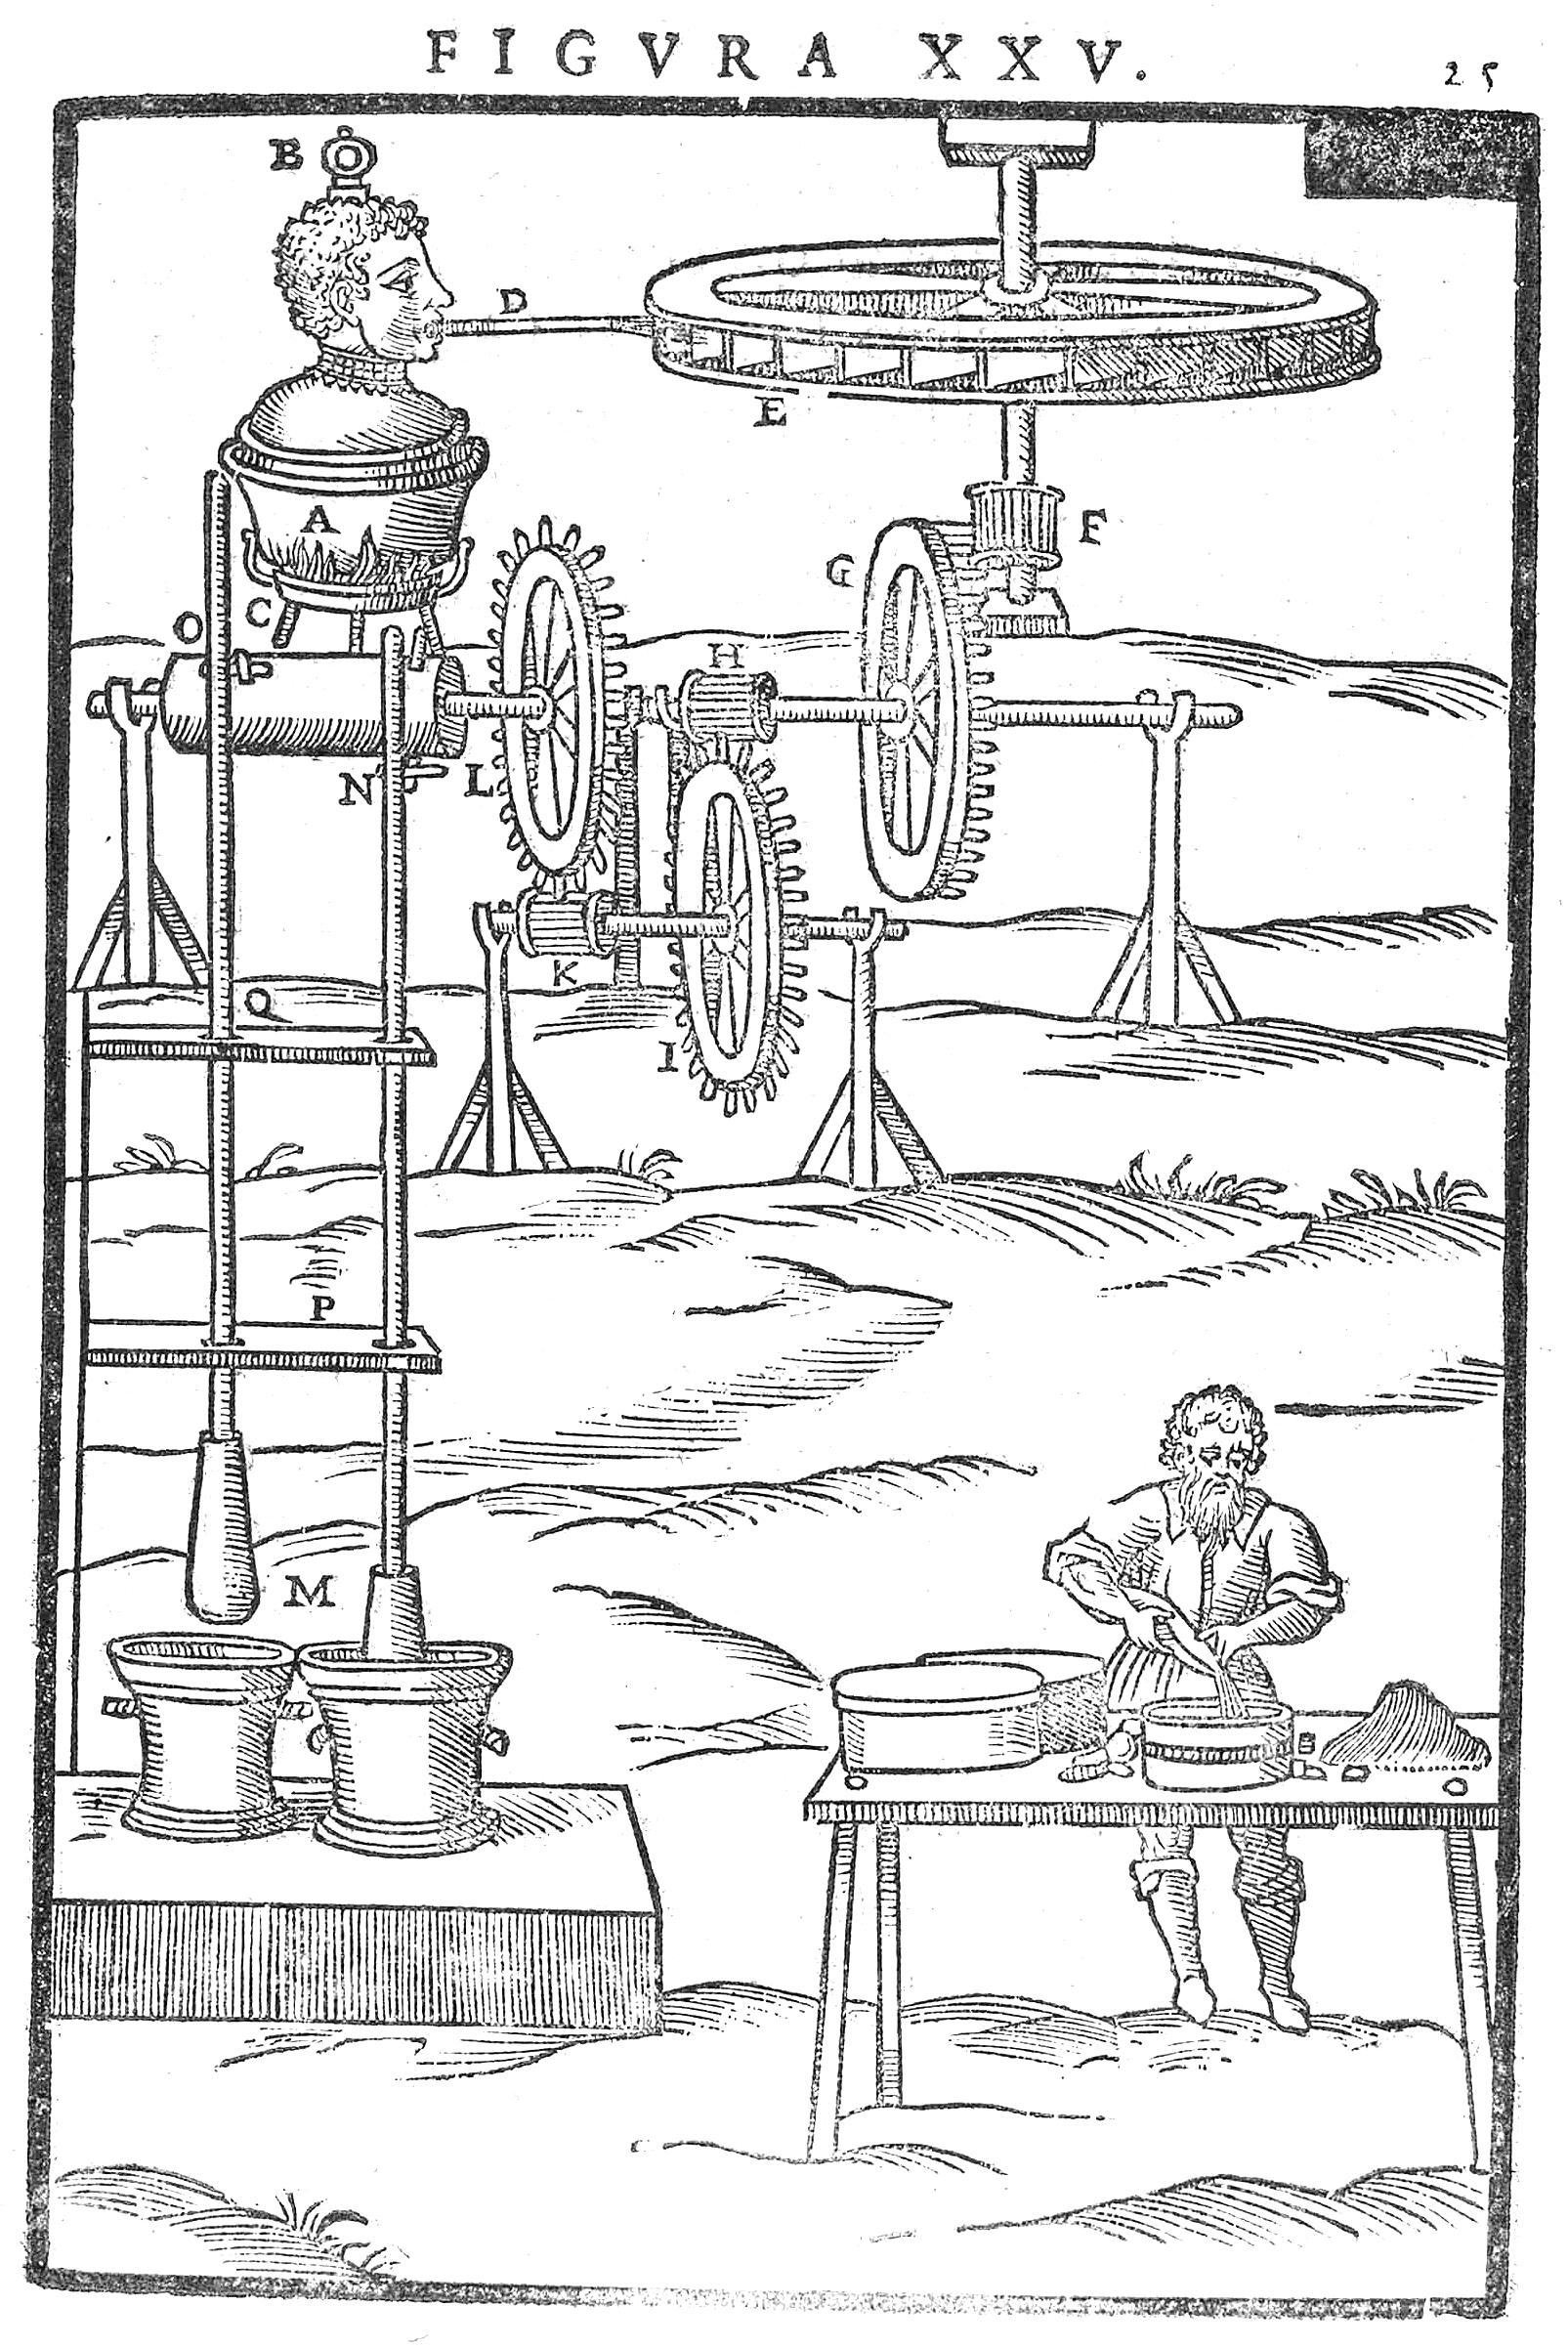 Dampfmaschine_Branca_1629.png